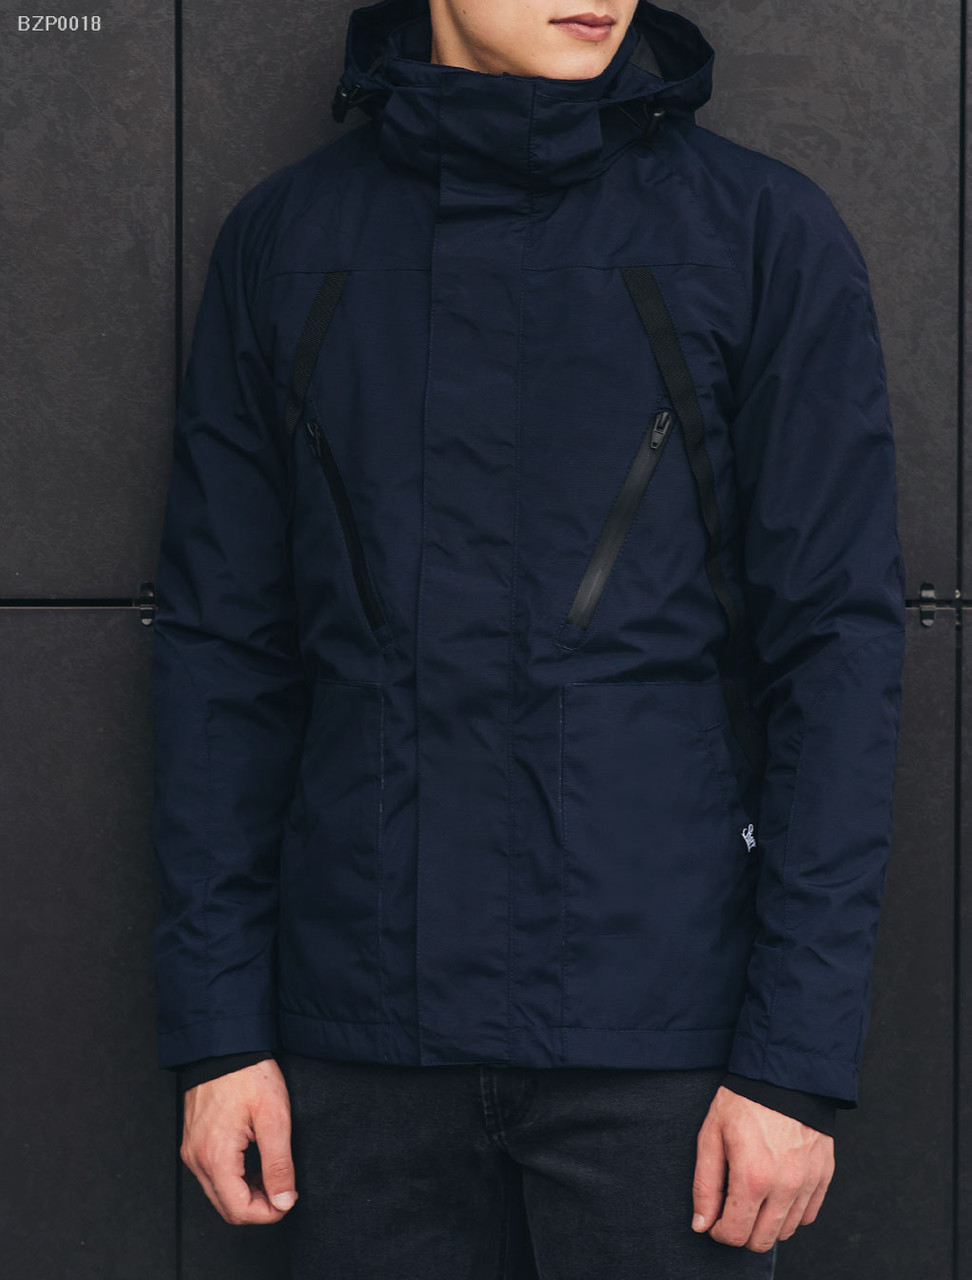 Весенне-осенняя куртка Staff - Shott navy Art. BZP0018 (Размеры - XL ... ca01fee636029